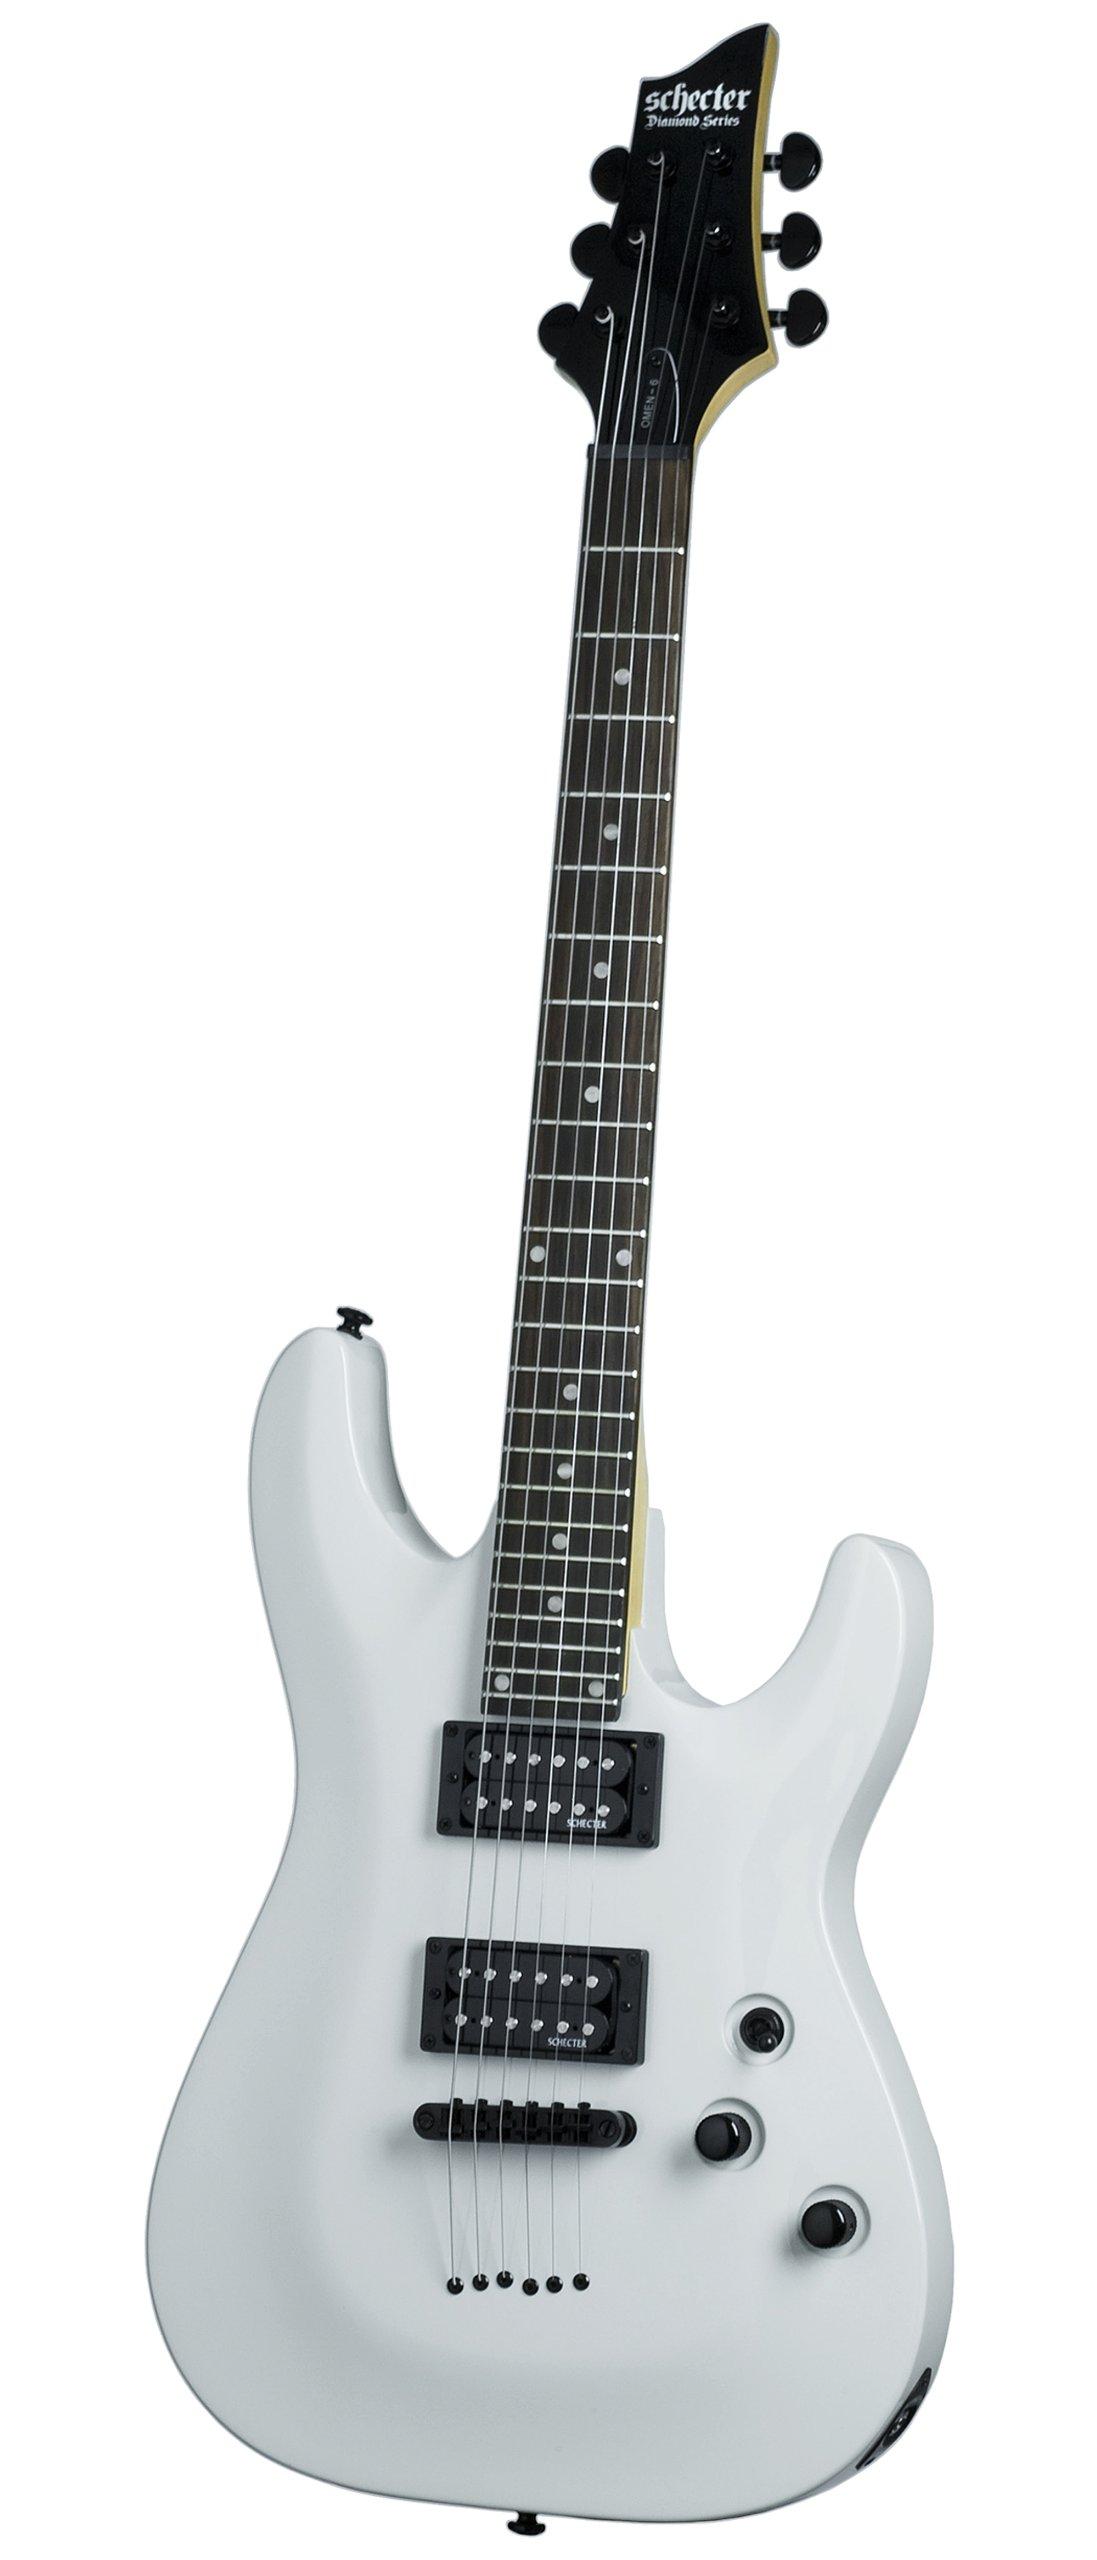 Cheap Schecter Omen-6 Electric Guitar (Gloss White) Black Friday & Cyber Monday 2019